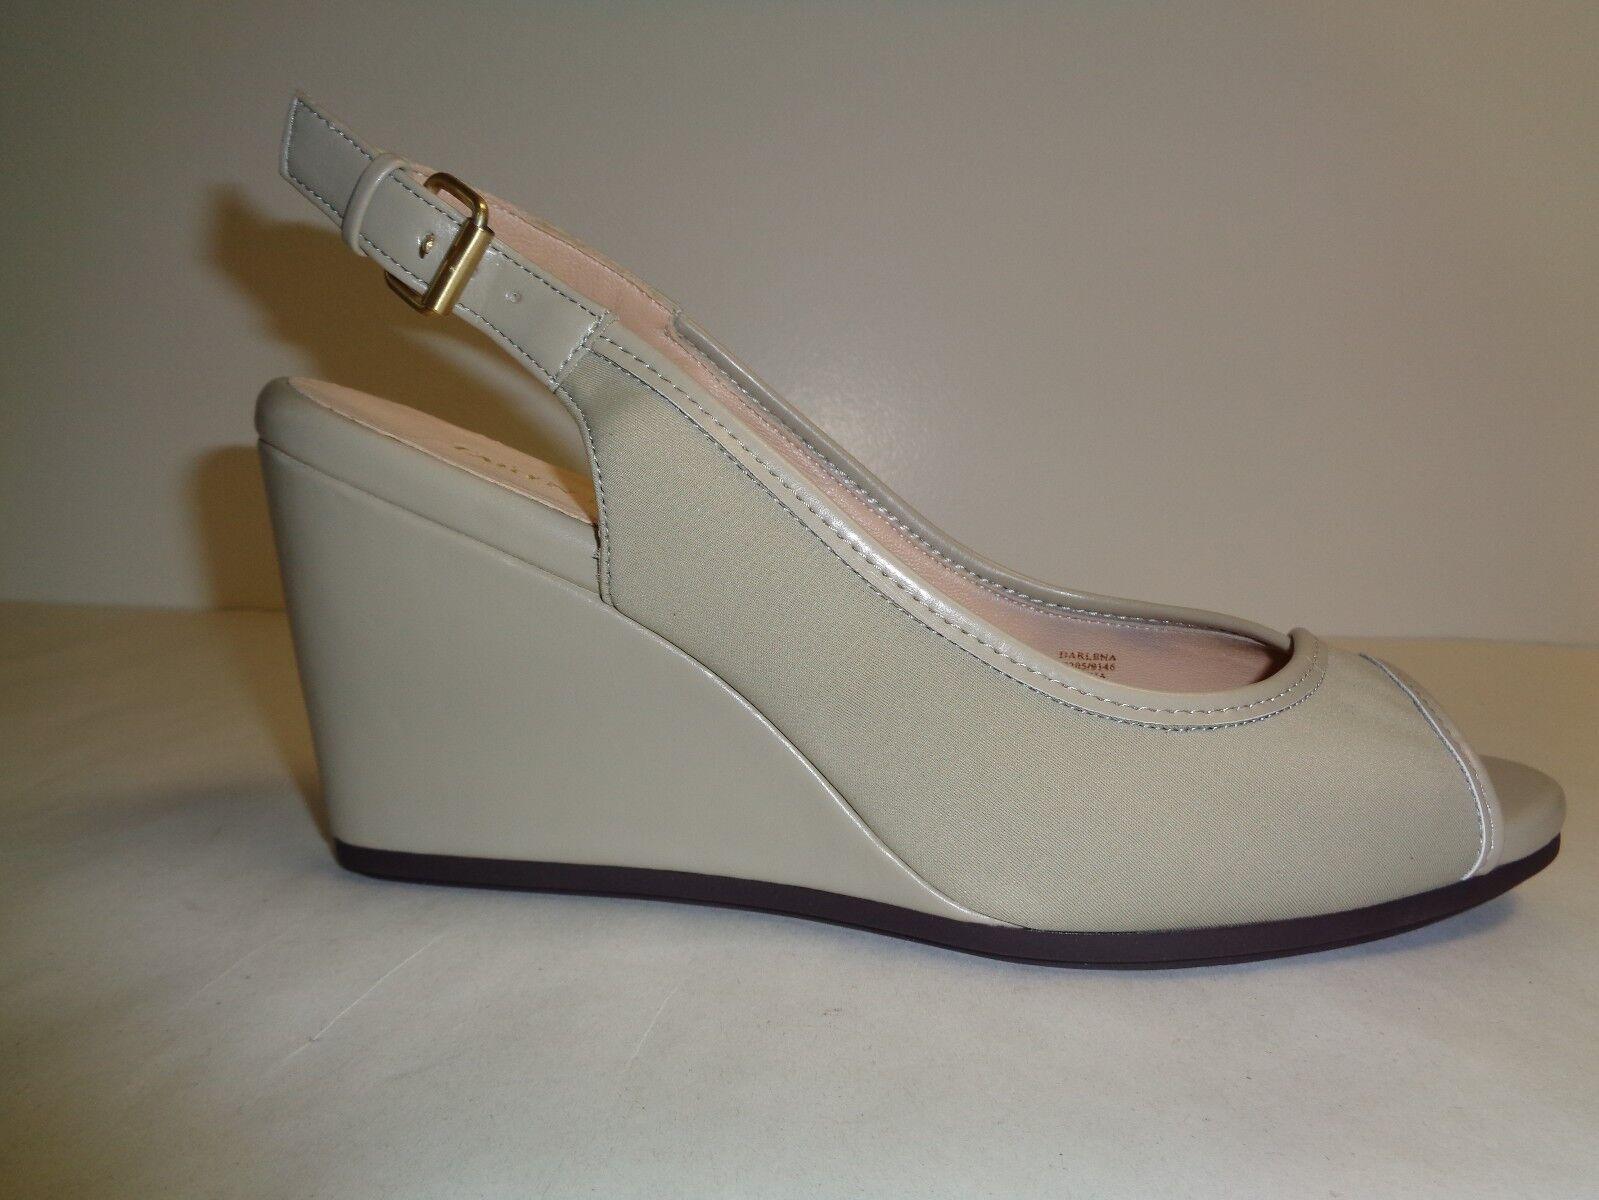 Taryn Rose Größe 11 M DARLENA Beige Leder Wedge Sandales NEU Damenschuhe Schuhes